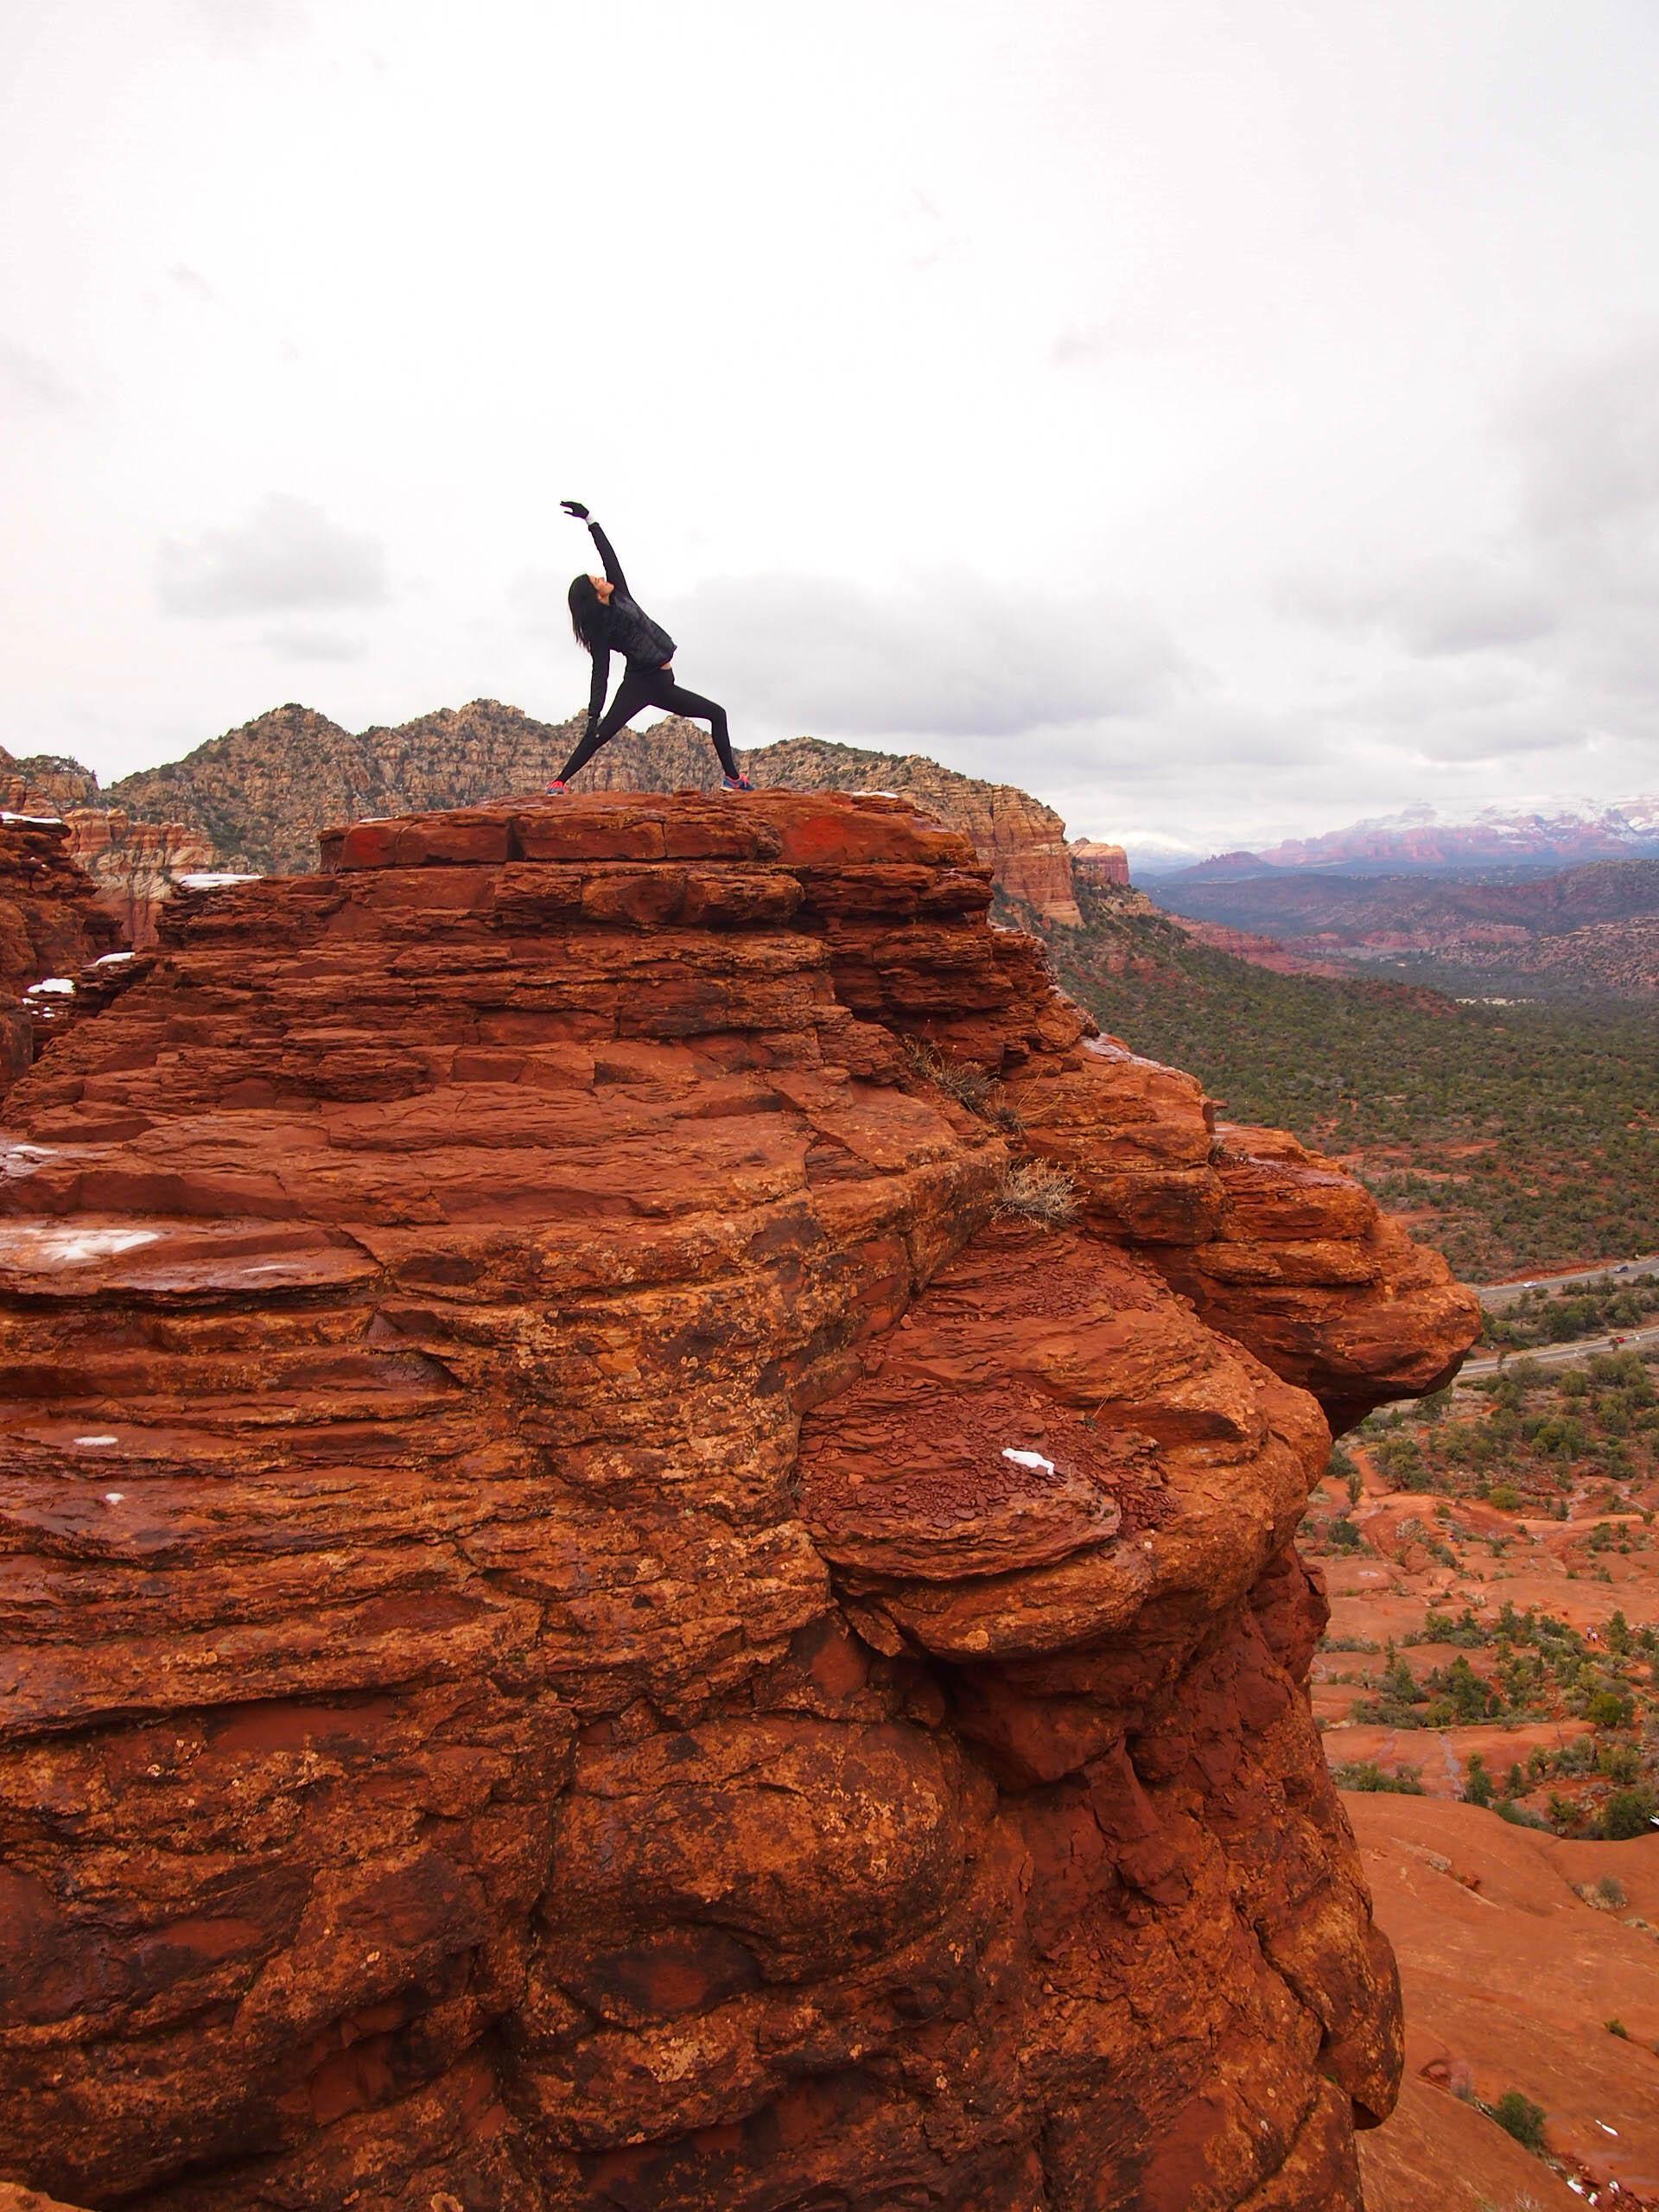 Obligatory yoga pic